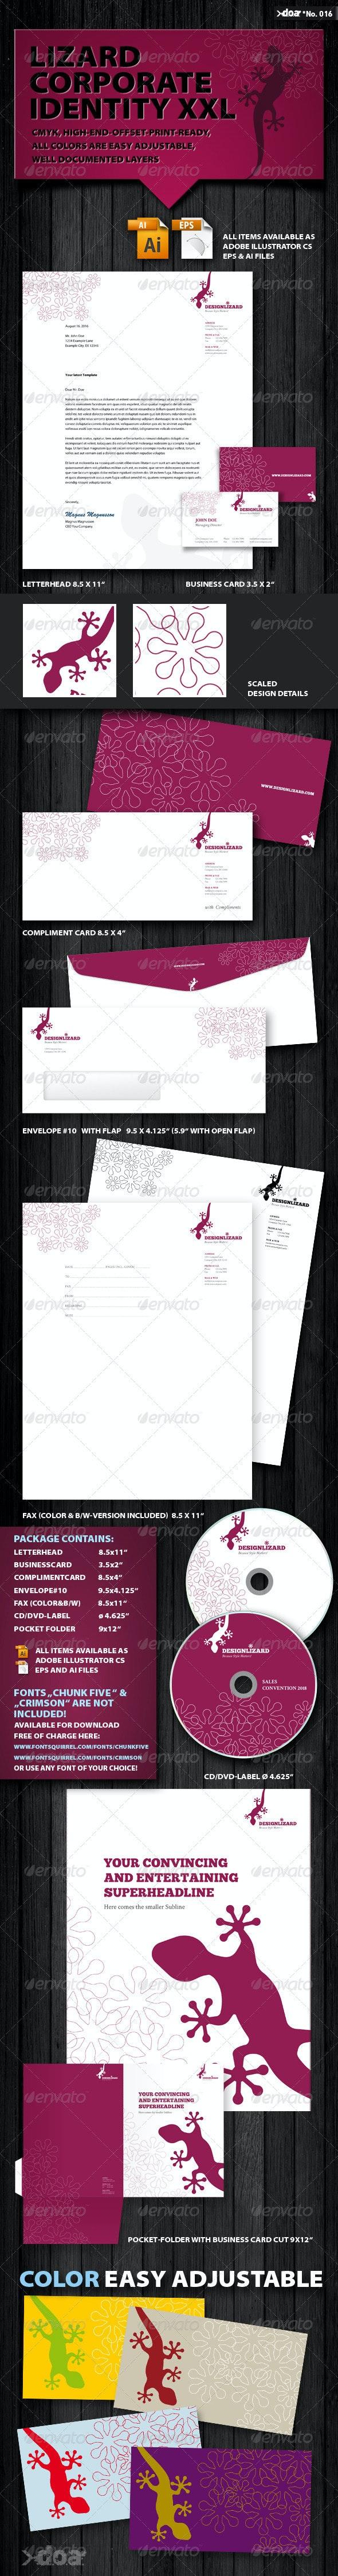 Design Lizard Corporate Identity XXL - Stationery Print Templates